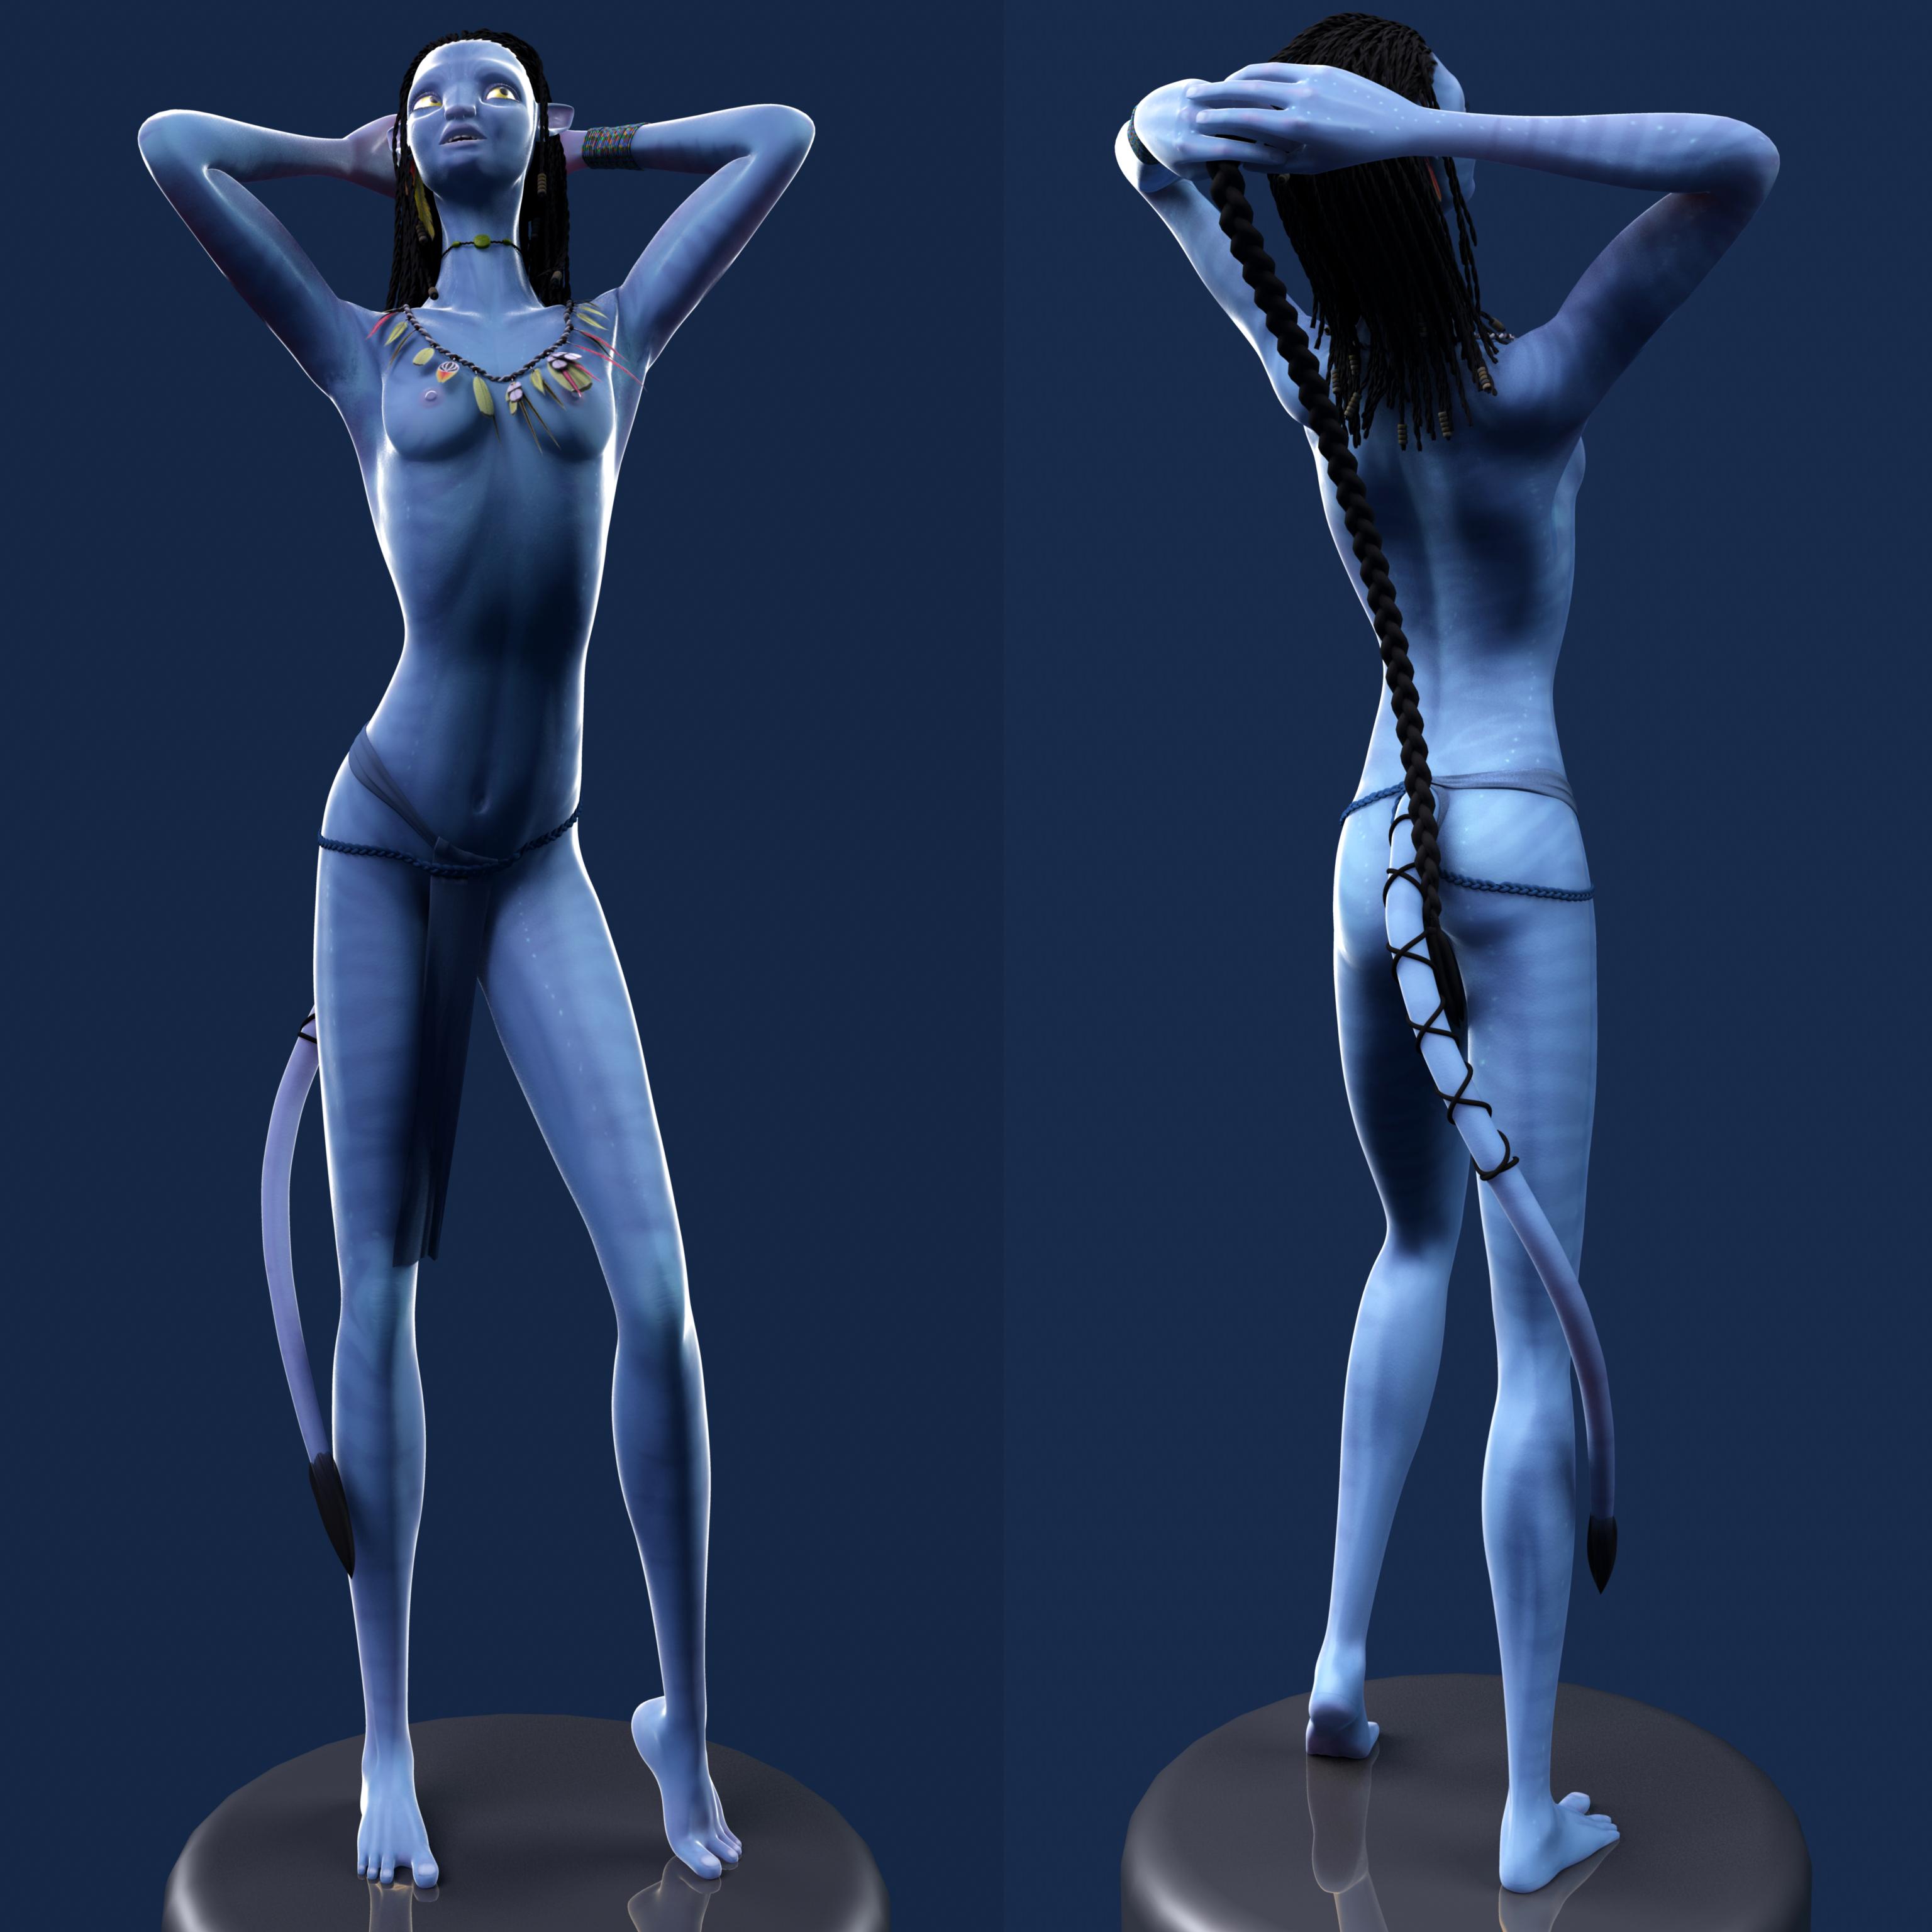 Avatar3dsex game porncraft pic